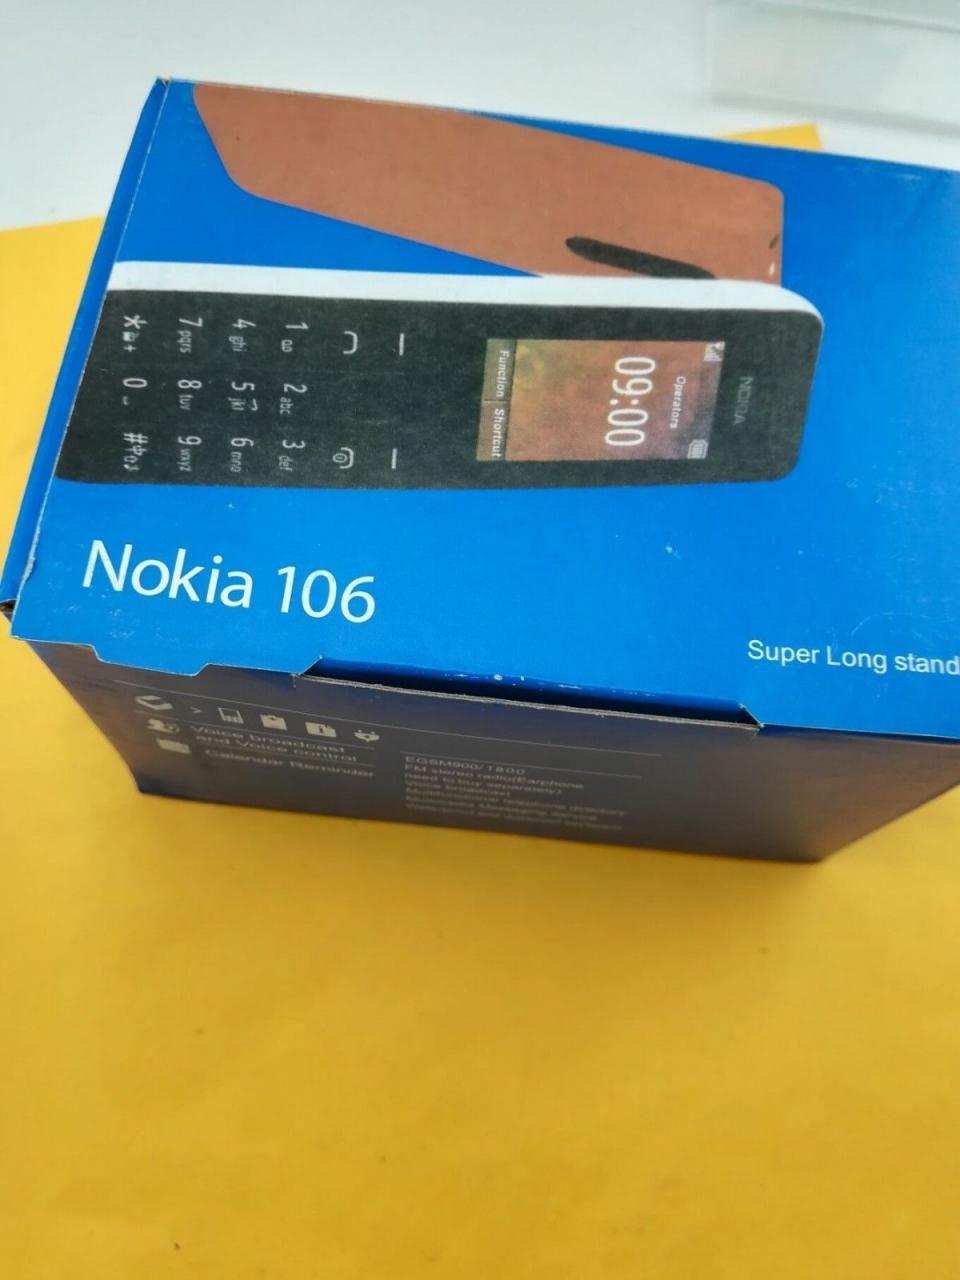 new Nokia 106 Unlocked Simple Mobile Phone Multiple keyboards languages white 11